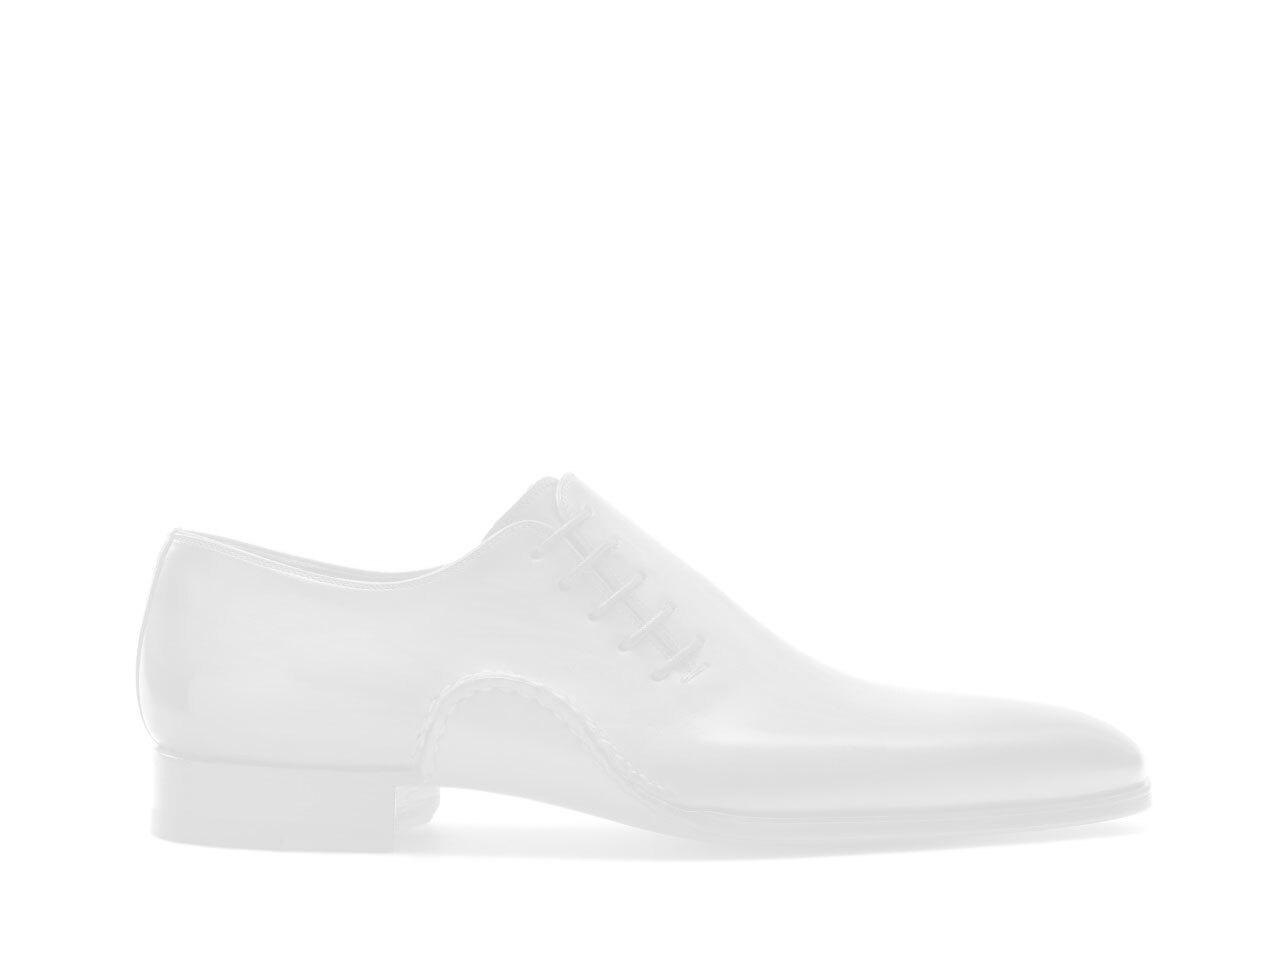 Sole of the Magnanni Frades Grafito Men's Single Monk Strap Shoes